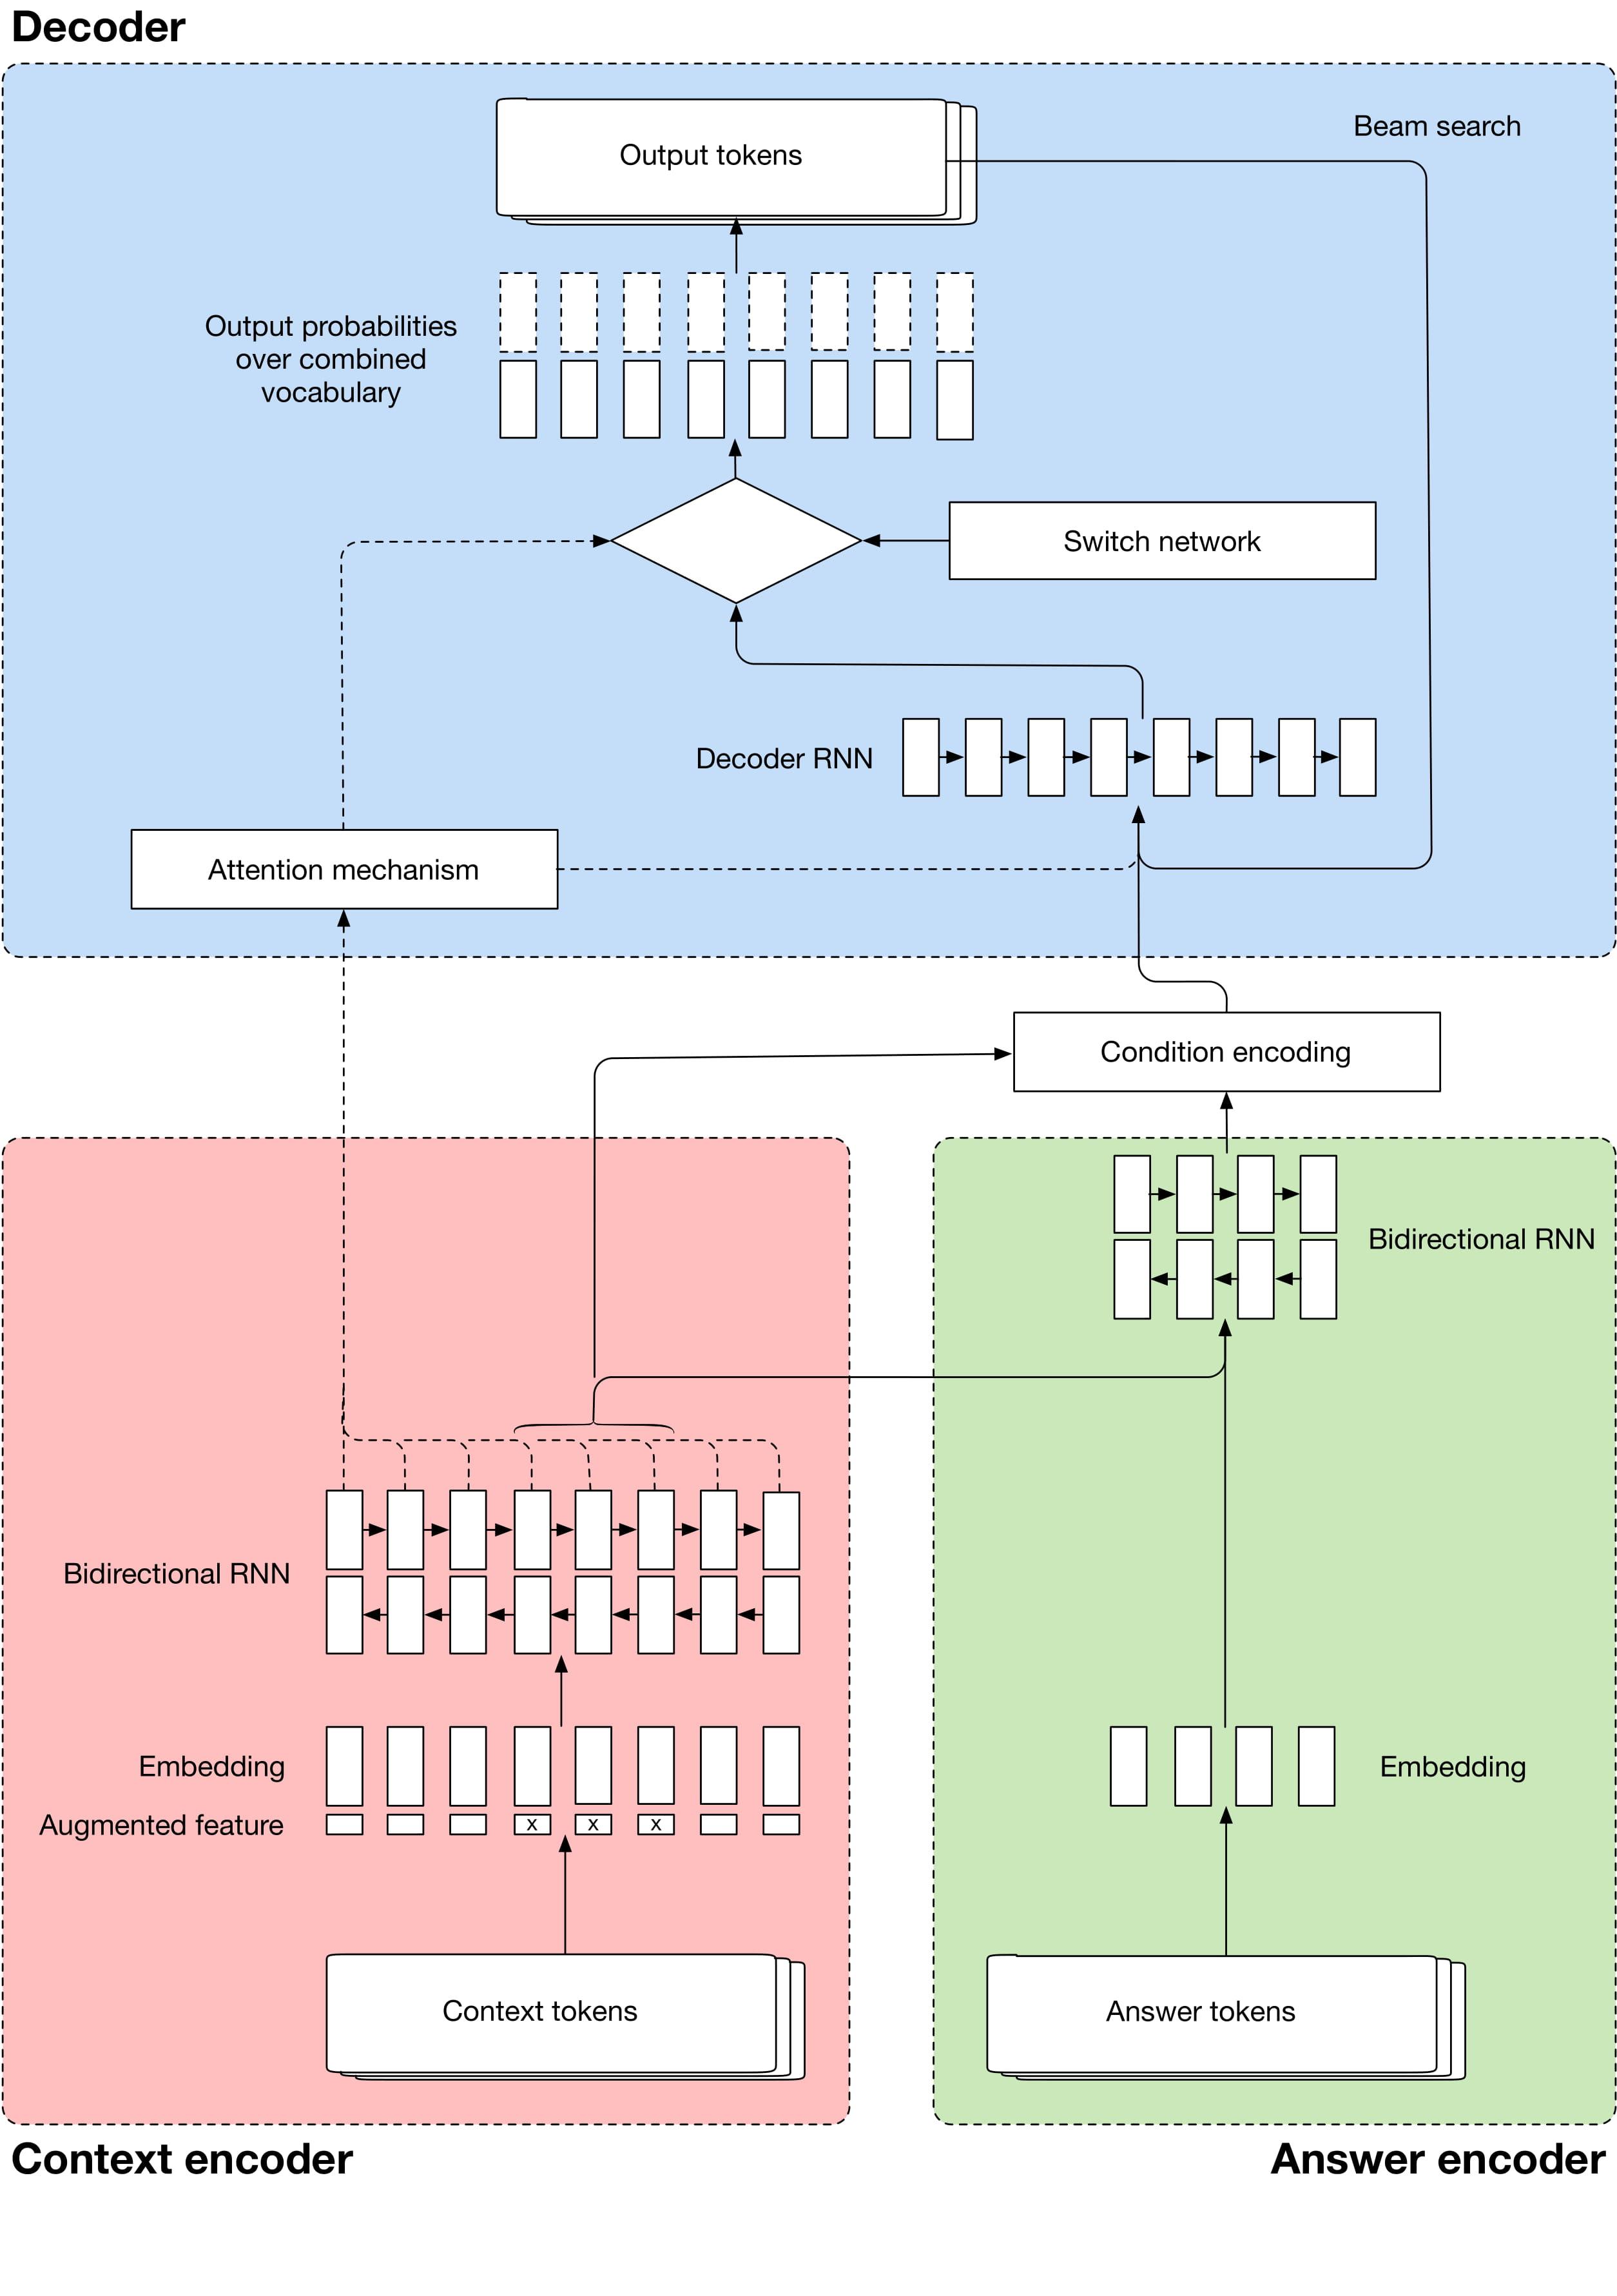 Evaluating Rewards for Question Generation Models